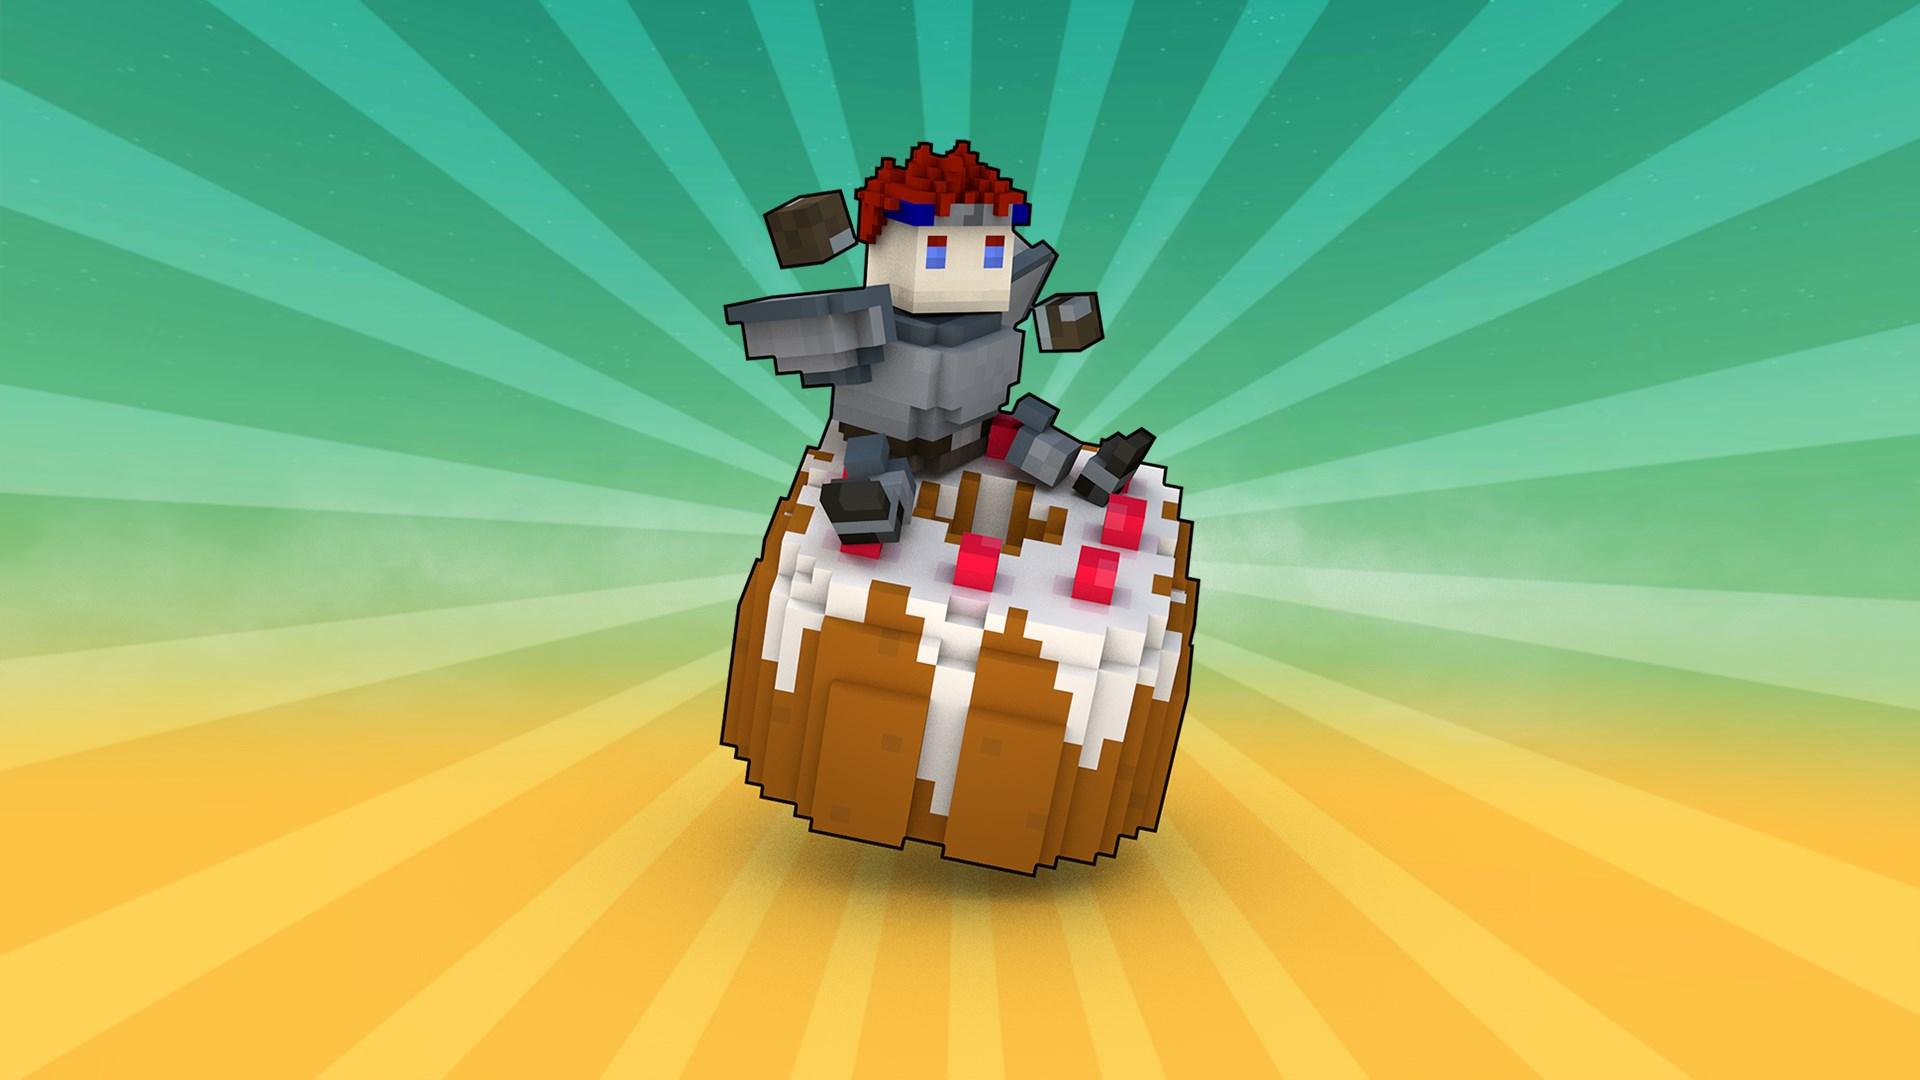 Trove - Blocky Bonus: Bounding Bundt Cake